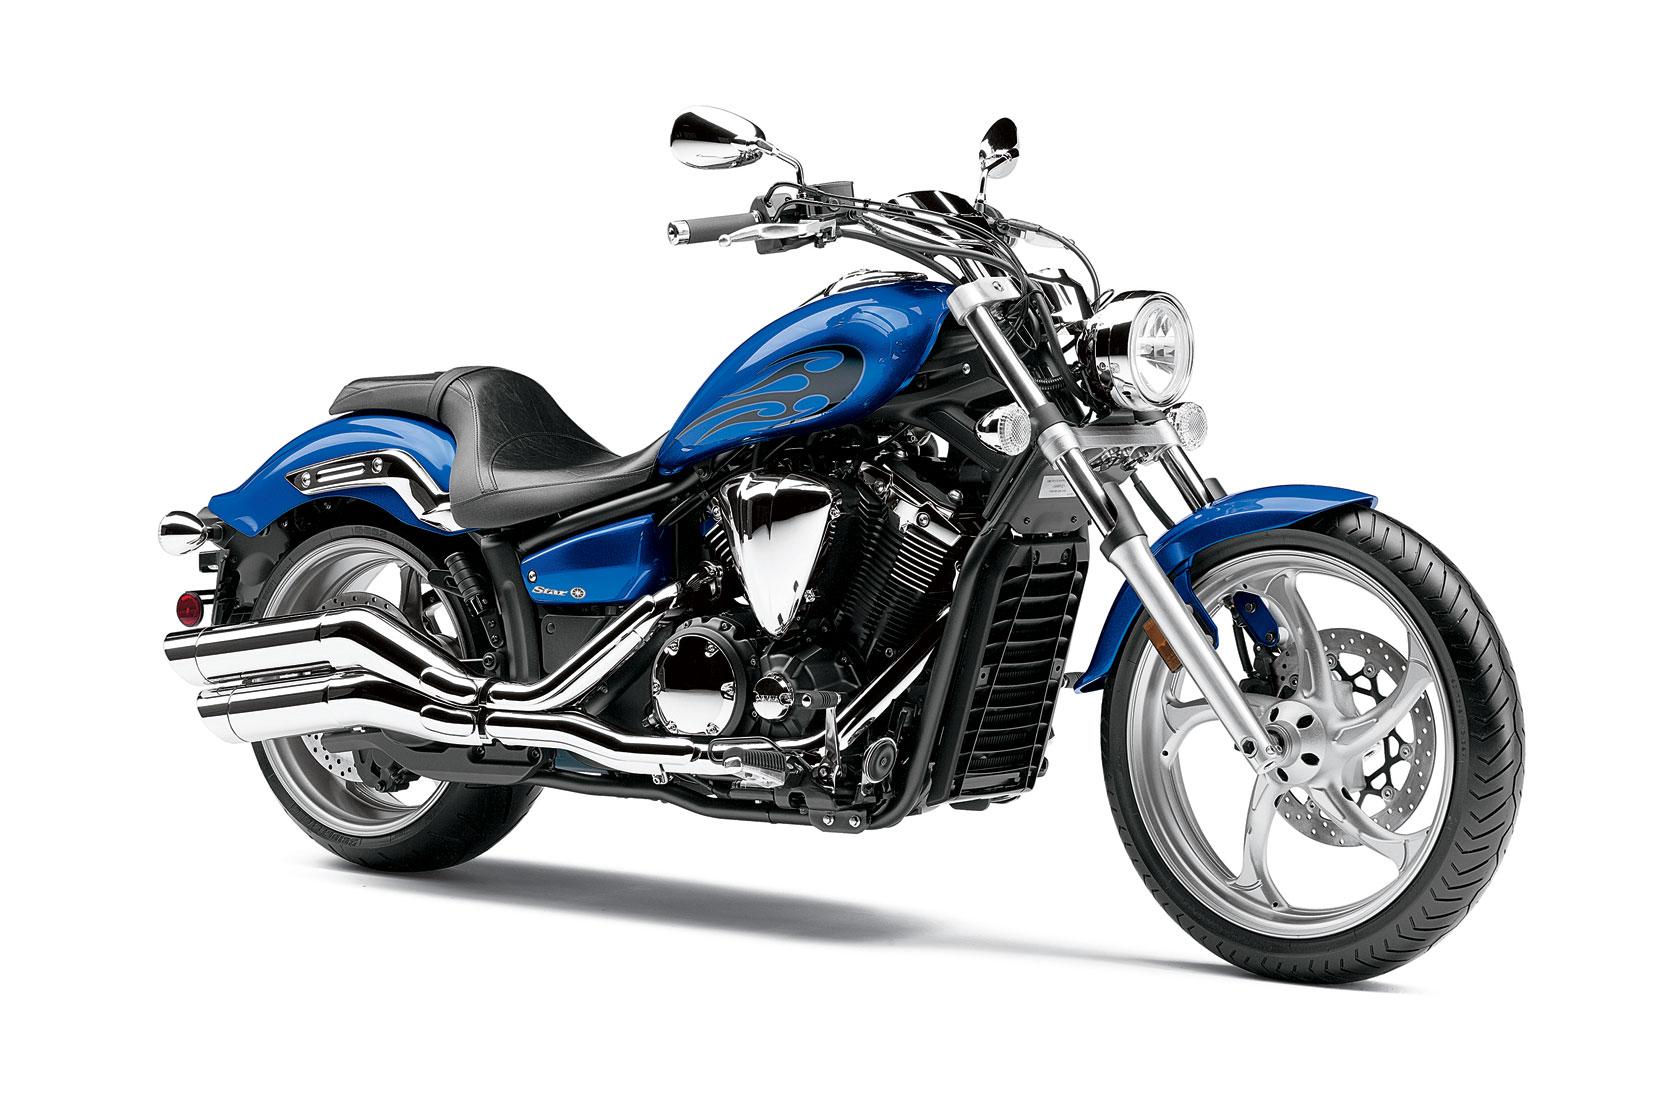 Yamaha stryker specs 2010 2011 autoevolution for 2018 yamaha stryker